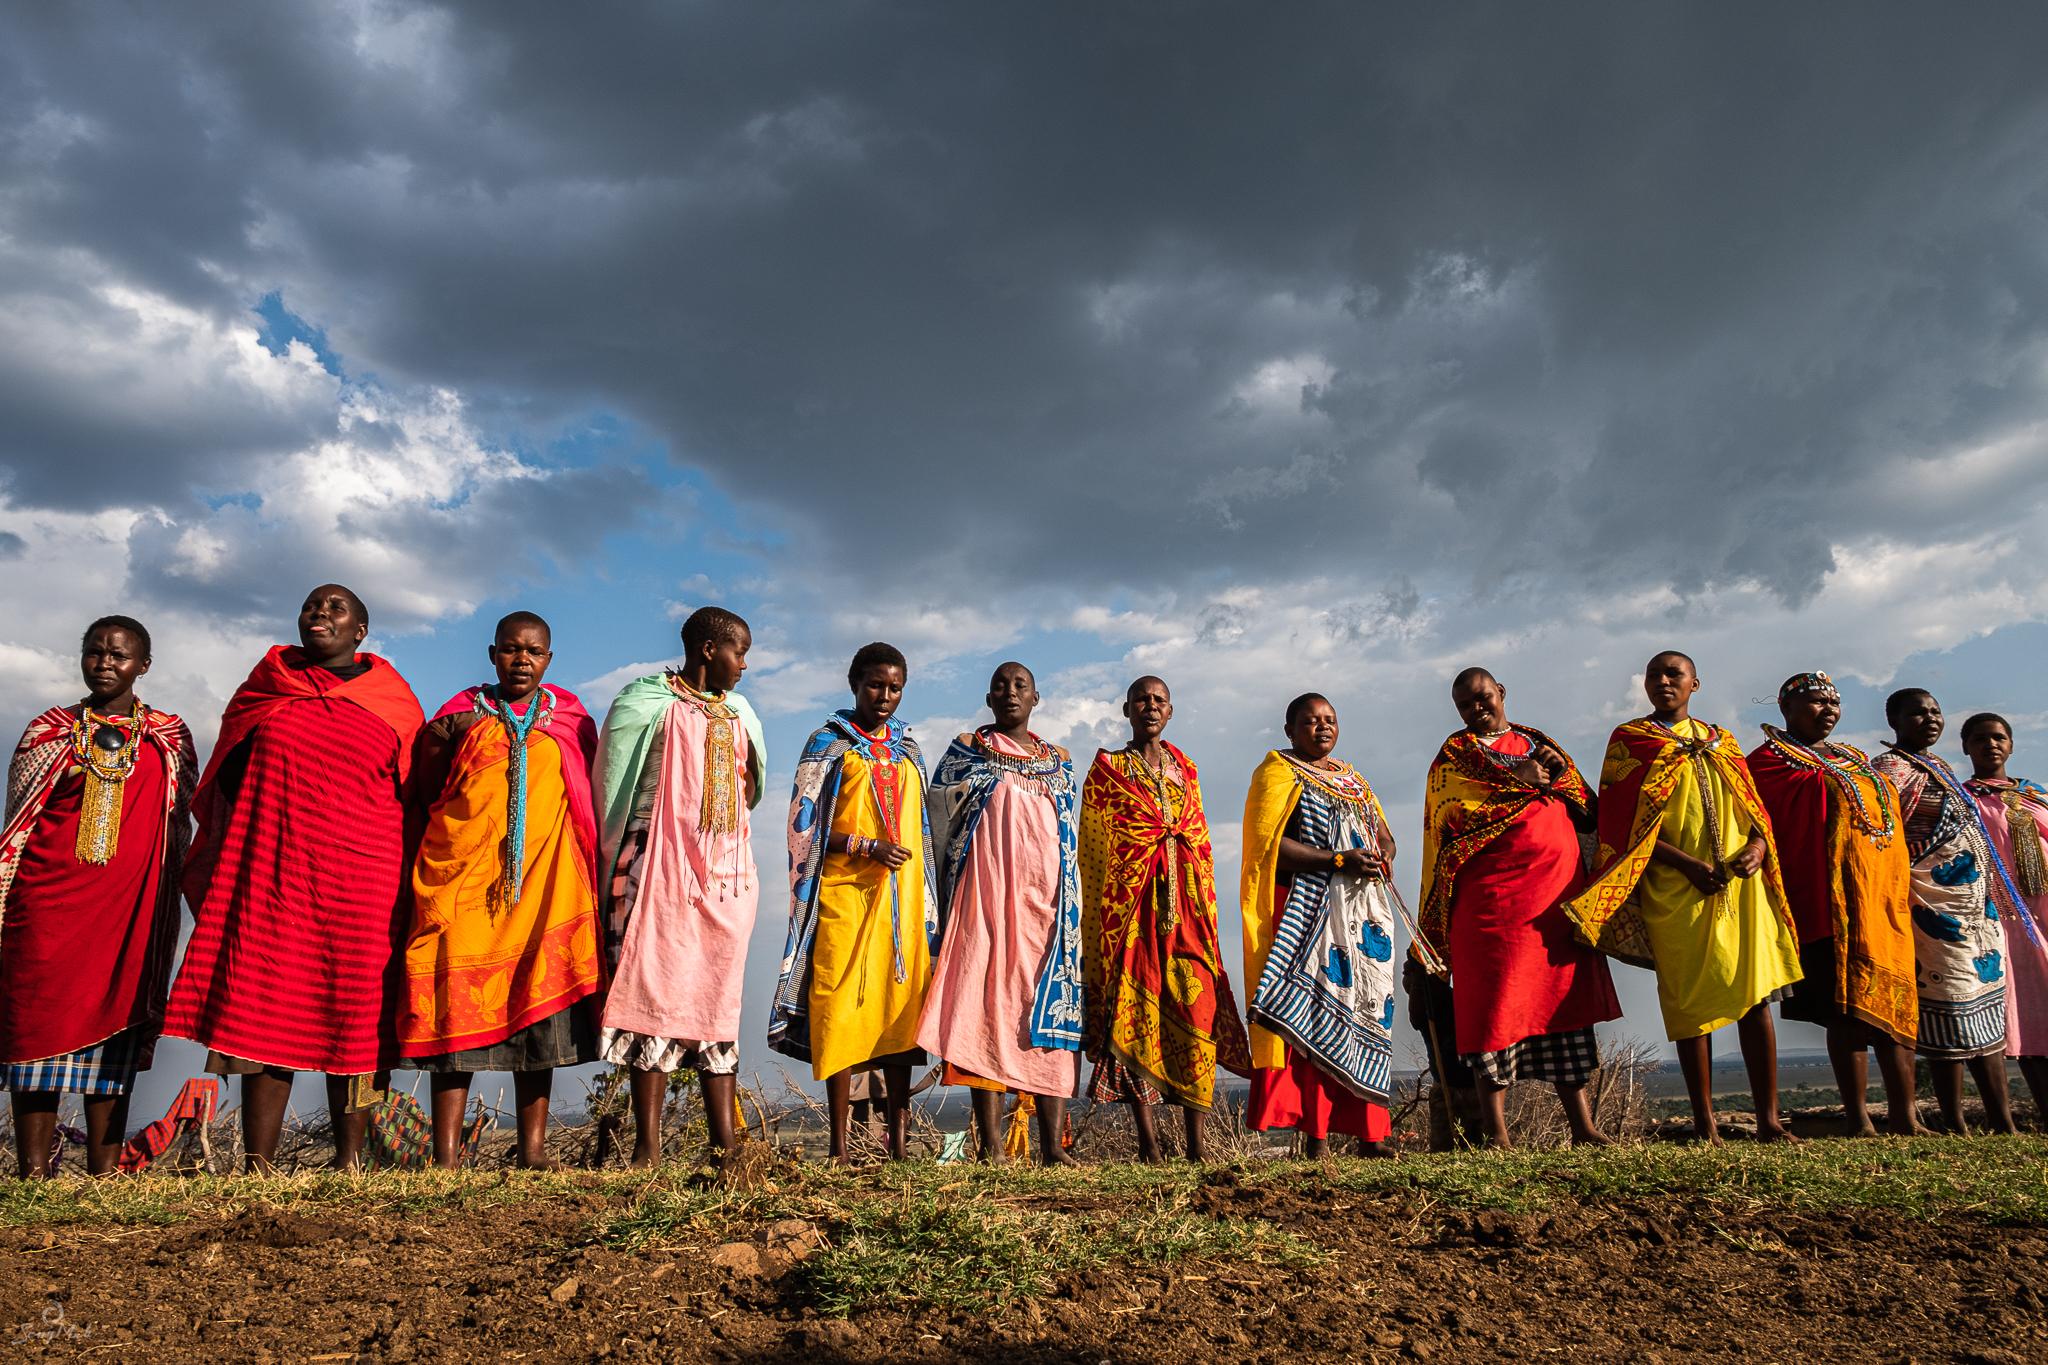 Masai women singing